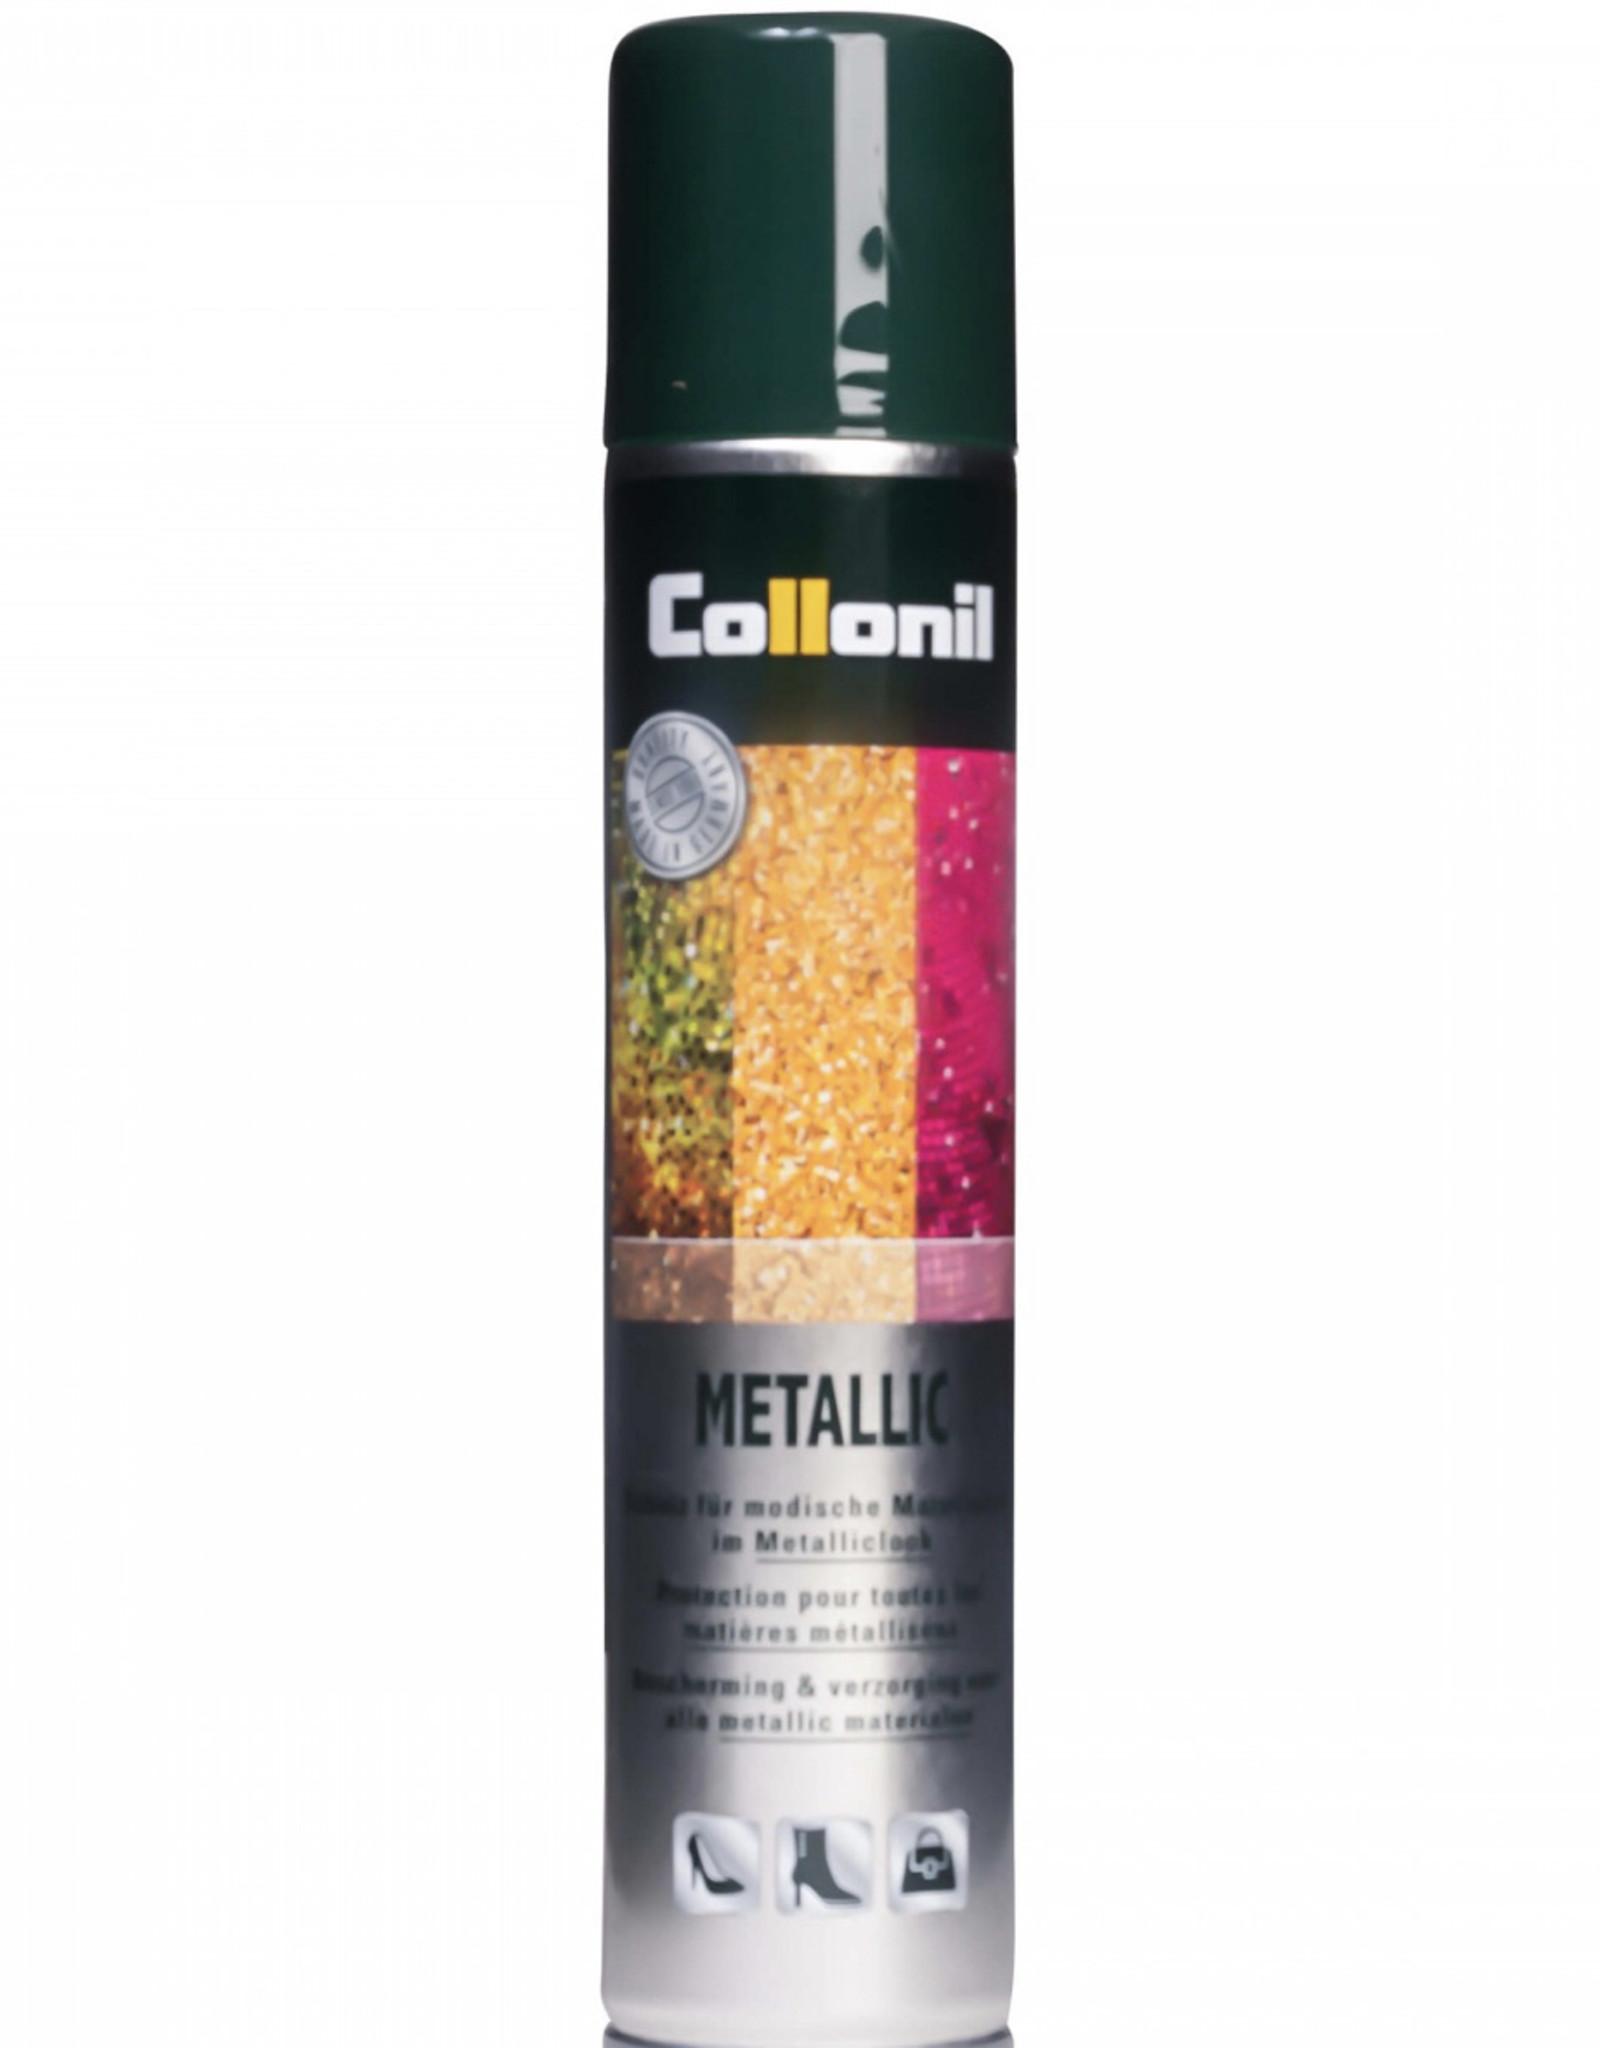 Collonil Metallic Spray 200ml